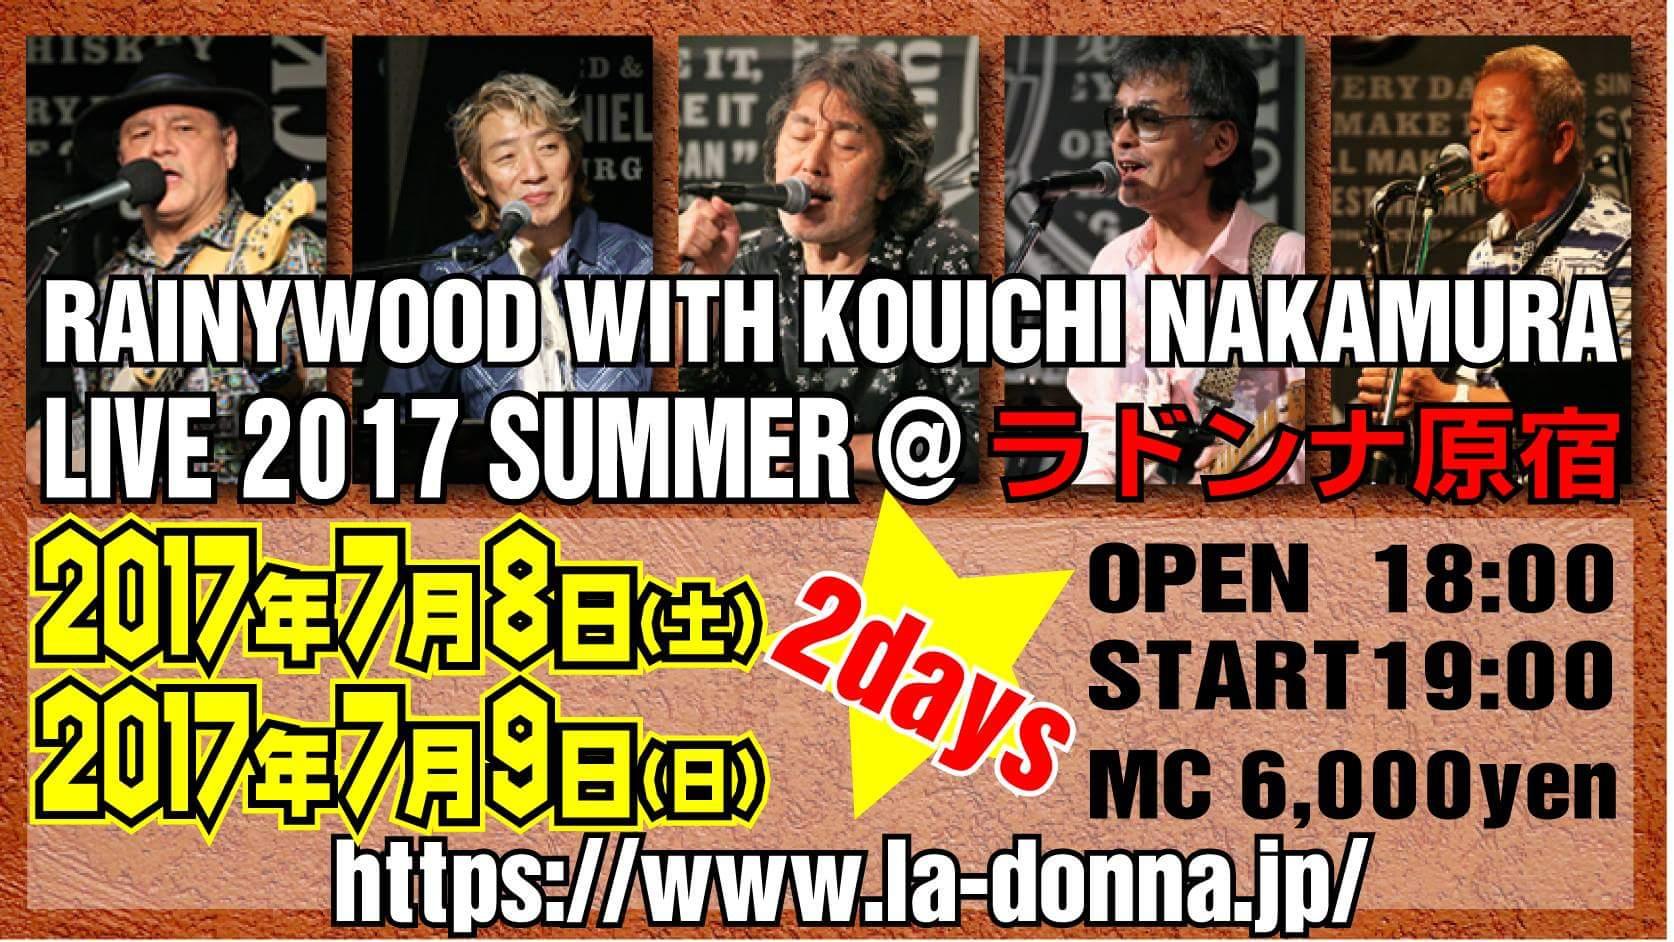 """RAINYWOOD WITH KOUICHI NAKAMURA LIVE 2017 SUMMER @ ラドンナ原宿"""